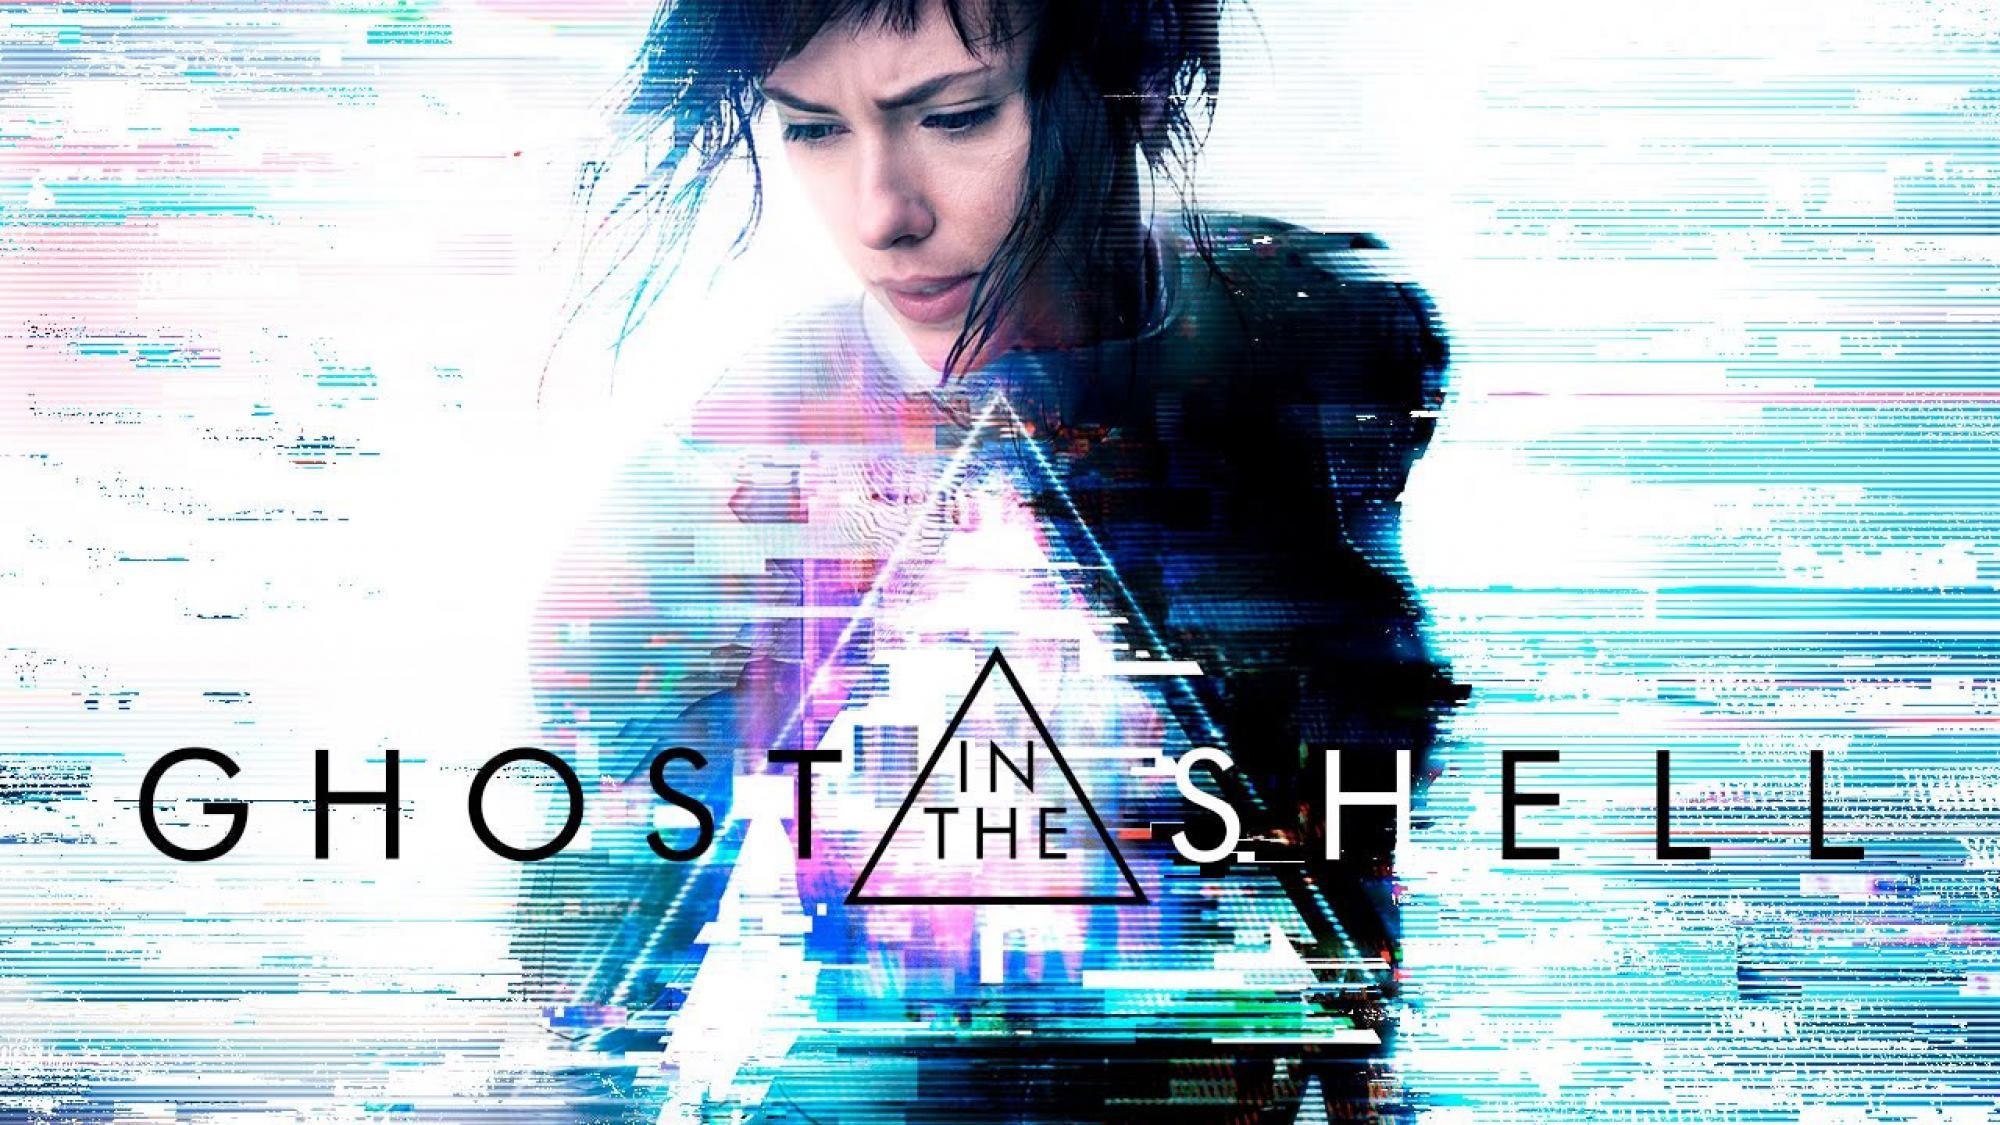 Fondo de pantalla de Poster Ghost in the Shell: vigilante del futuro Imágenes